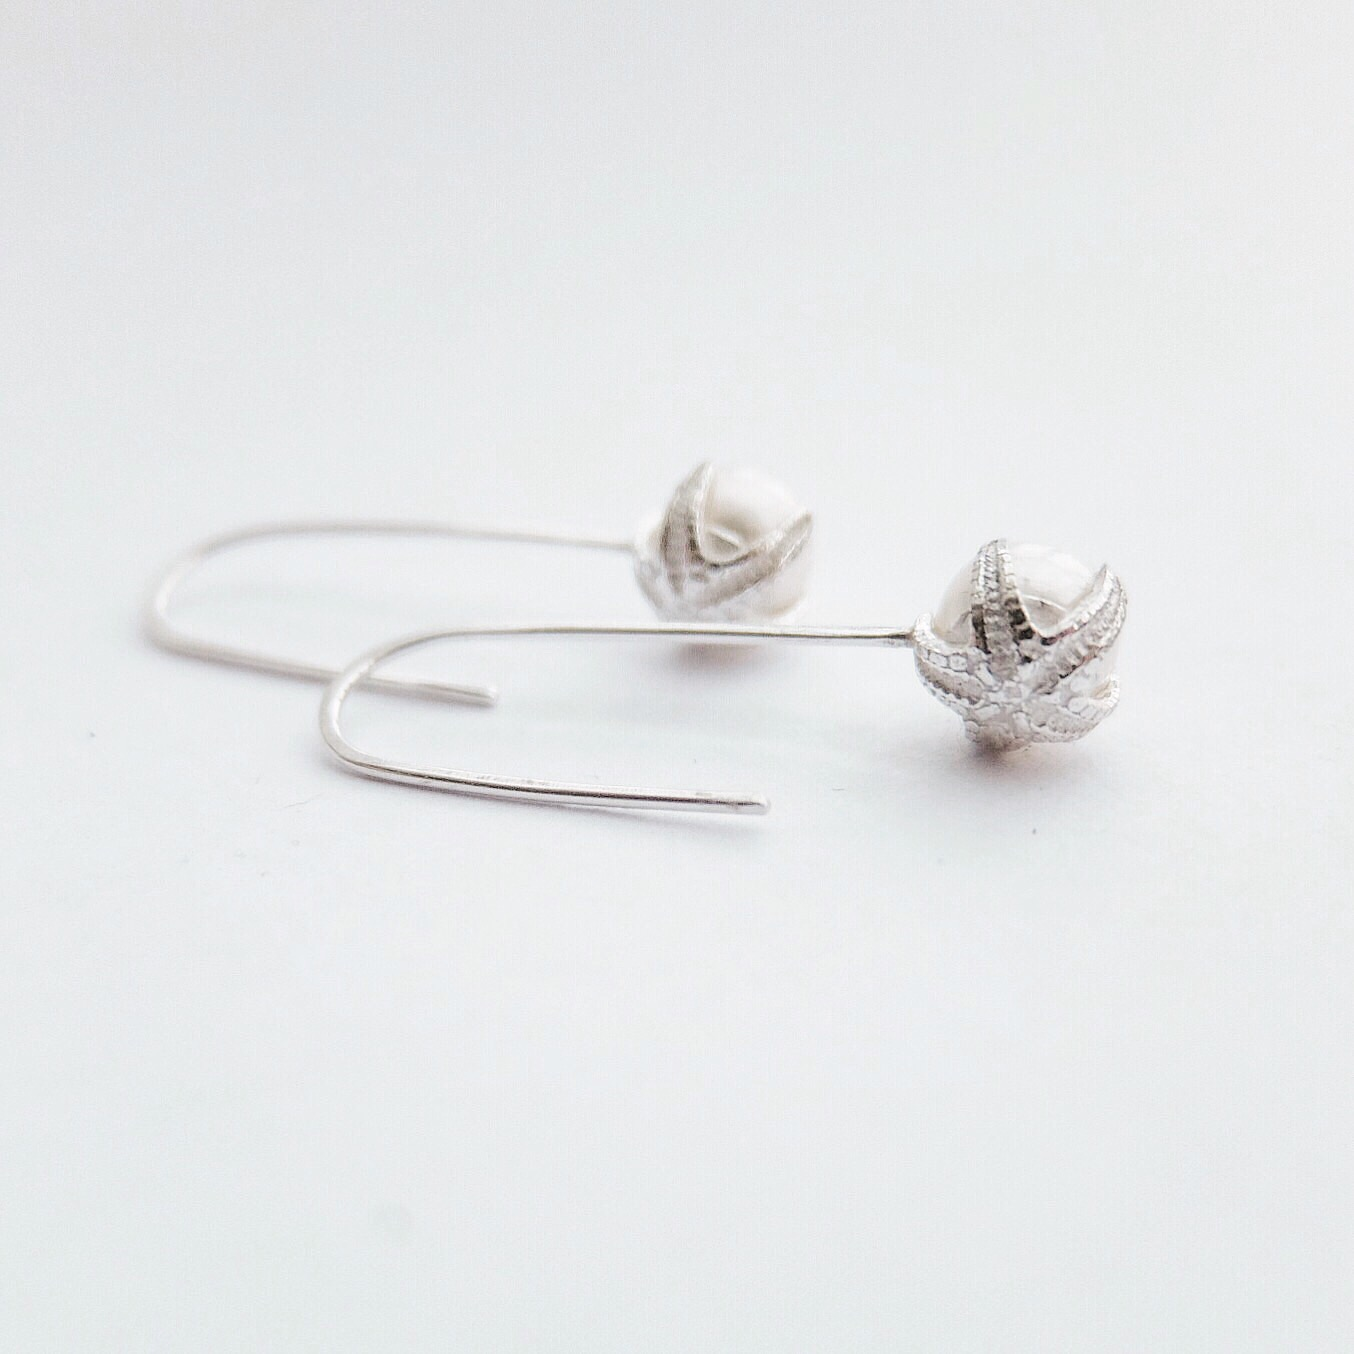 drop dangly contemporary freshwater pearl silver starfish earrings bespoke uk handmade earrings silver designer beach bridal jewellery pearls earrings wedding jewellery bride gifts white pearl simple jewelry made in devon uk exeter jasmine bowden.jpg